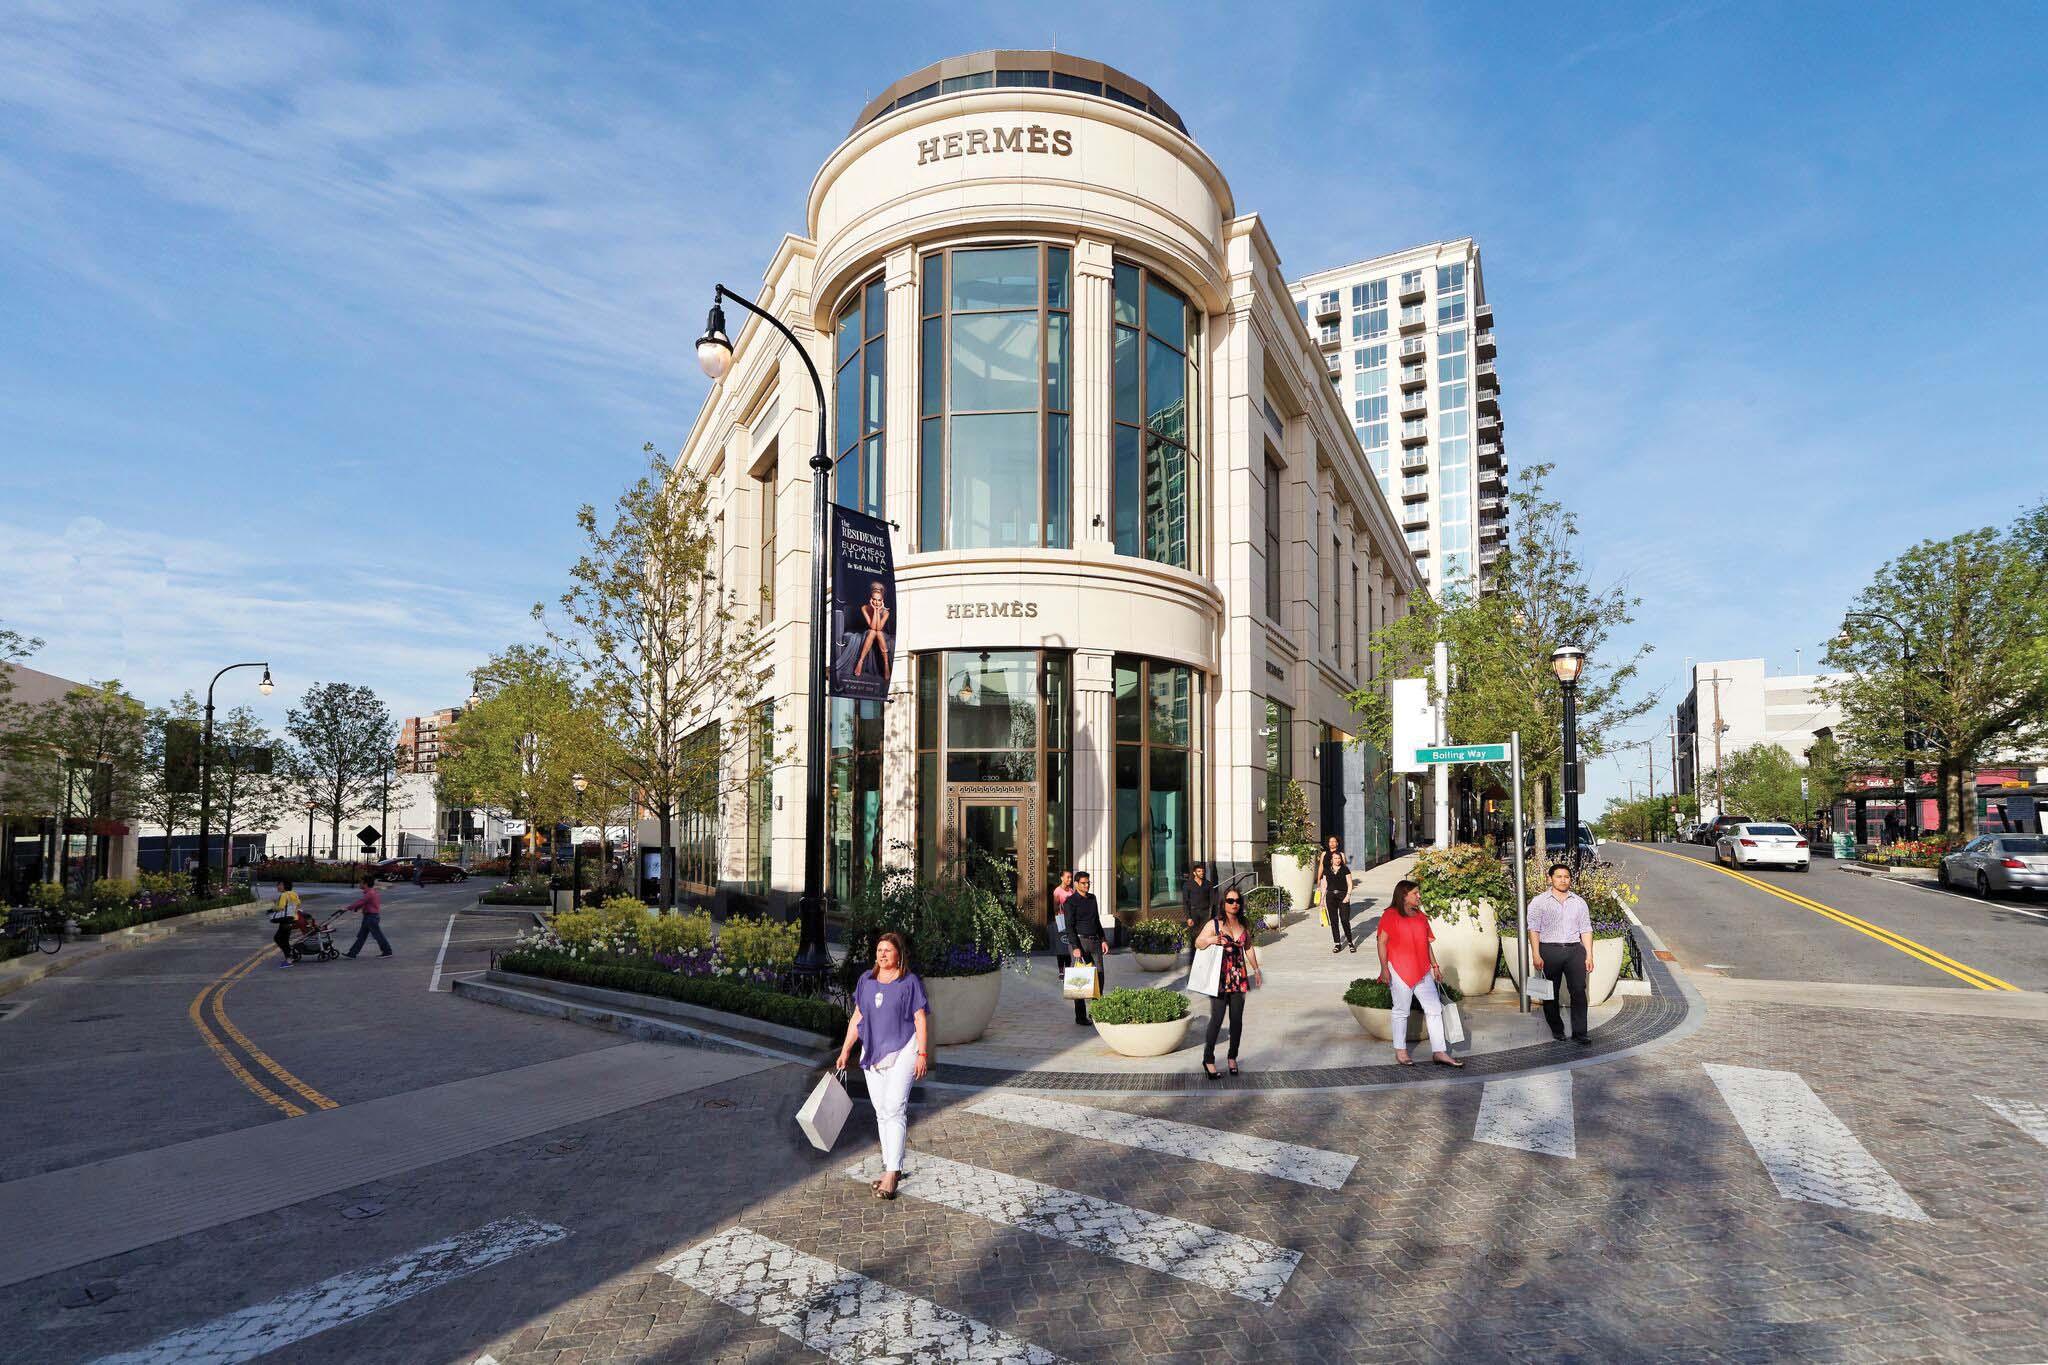 The shops at Bulkhead Atlanta is home to high-end retailers like Hermès.